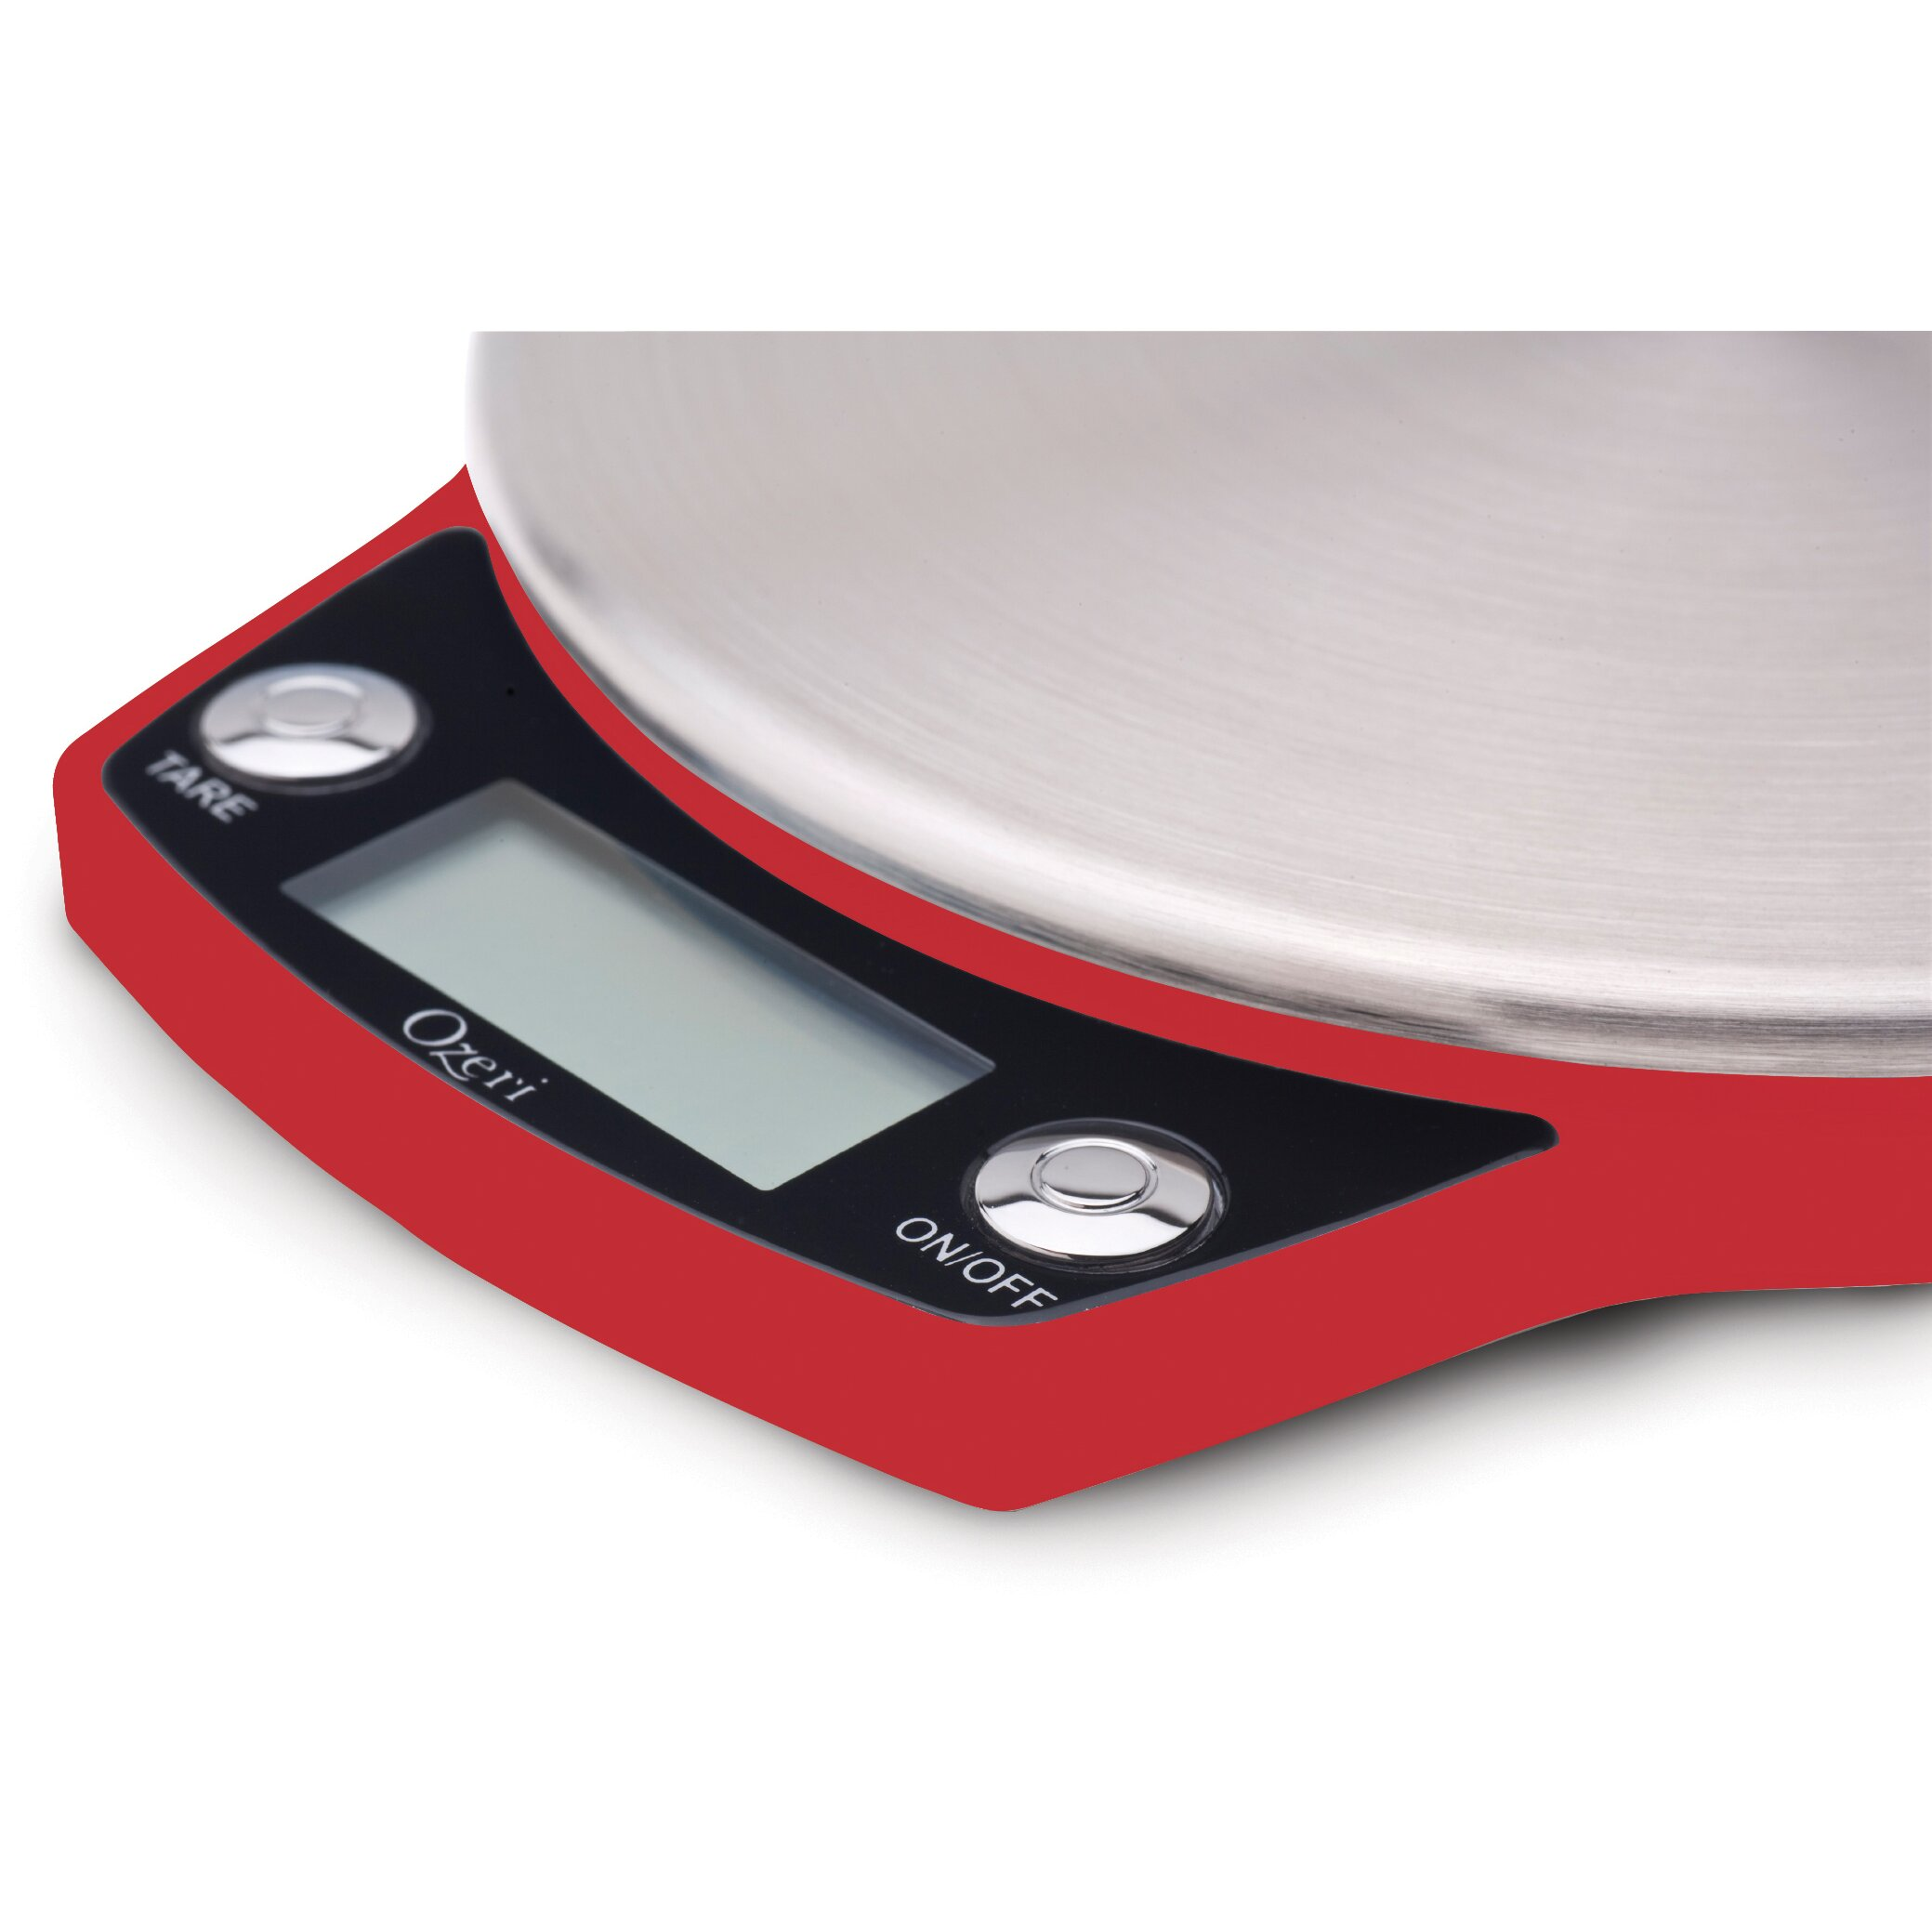 Ozeri Precision Pro Stainless Steel Digital Kitchen Scale Reviews Wayfair